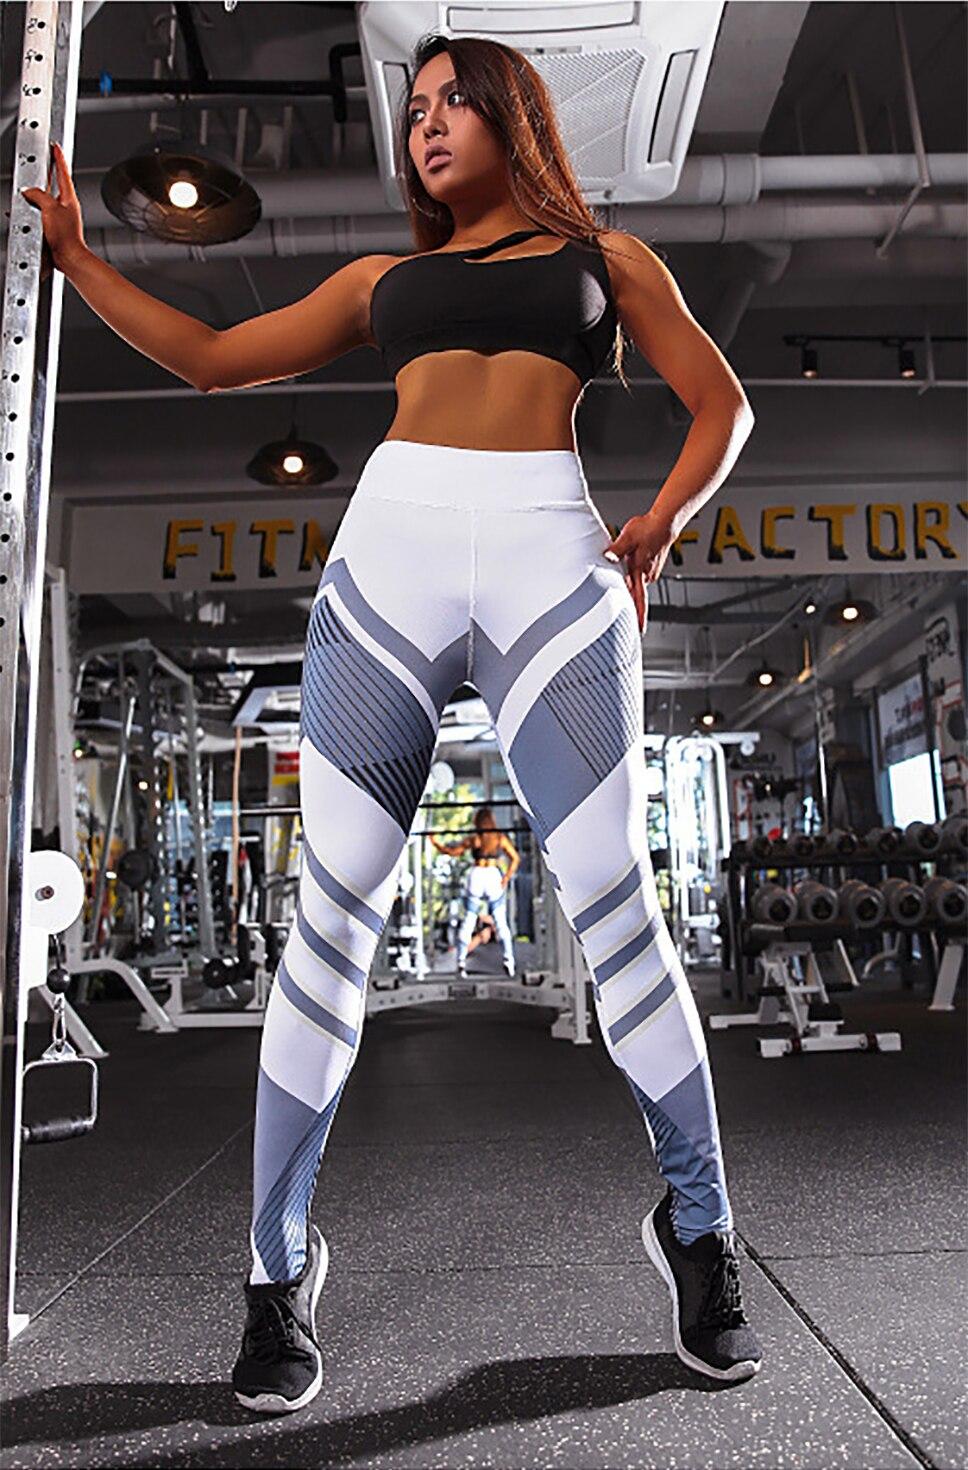 H5cf4baf4cf0b4eb8bd38d7db24ffd64ao BEFORW 2020 Fashion Polyester Digital Printing Leggings Plus Size Women Sexy Workout Black Leggings Camouflage Camo Pants